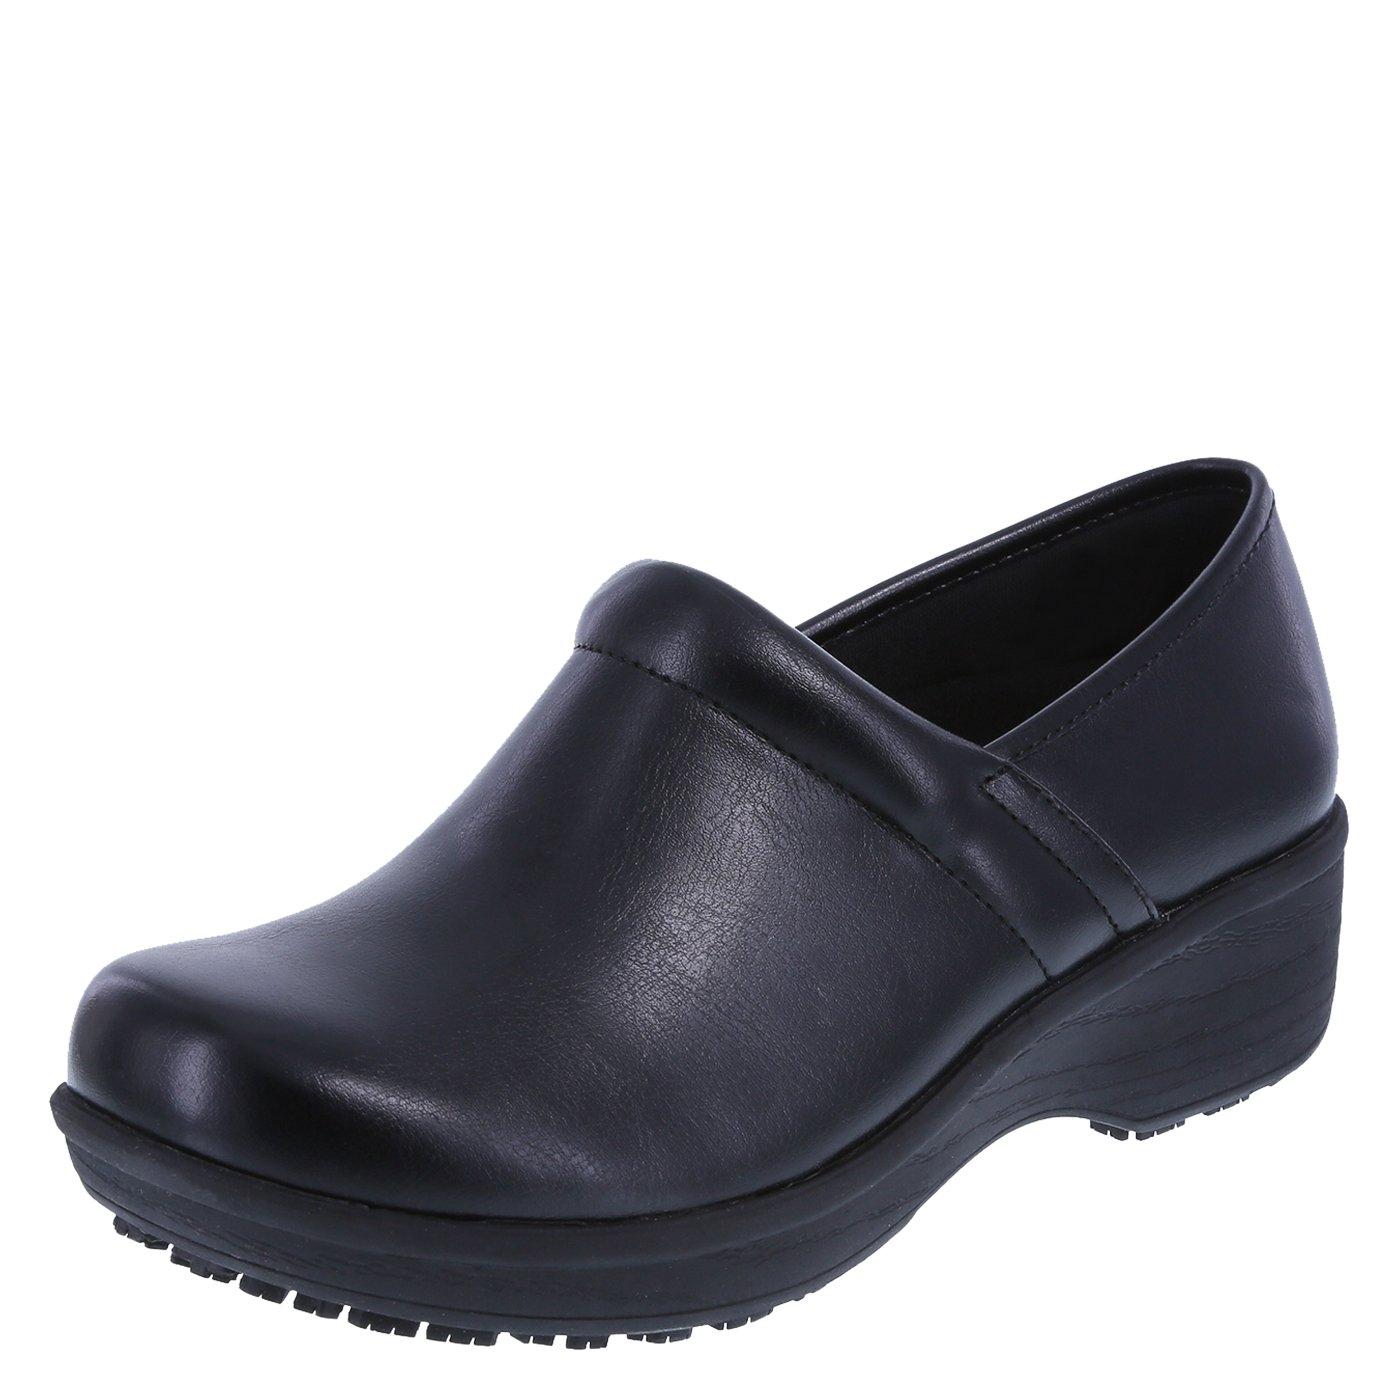 safeTstep Slip Resistant Women's Black Women's Gretchen Clog 8 Regular